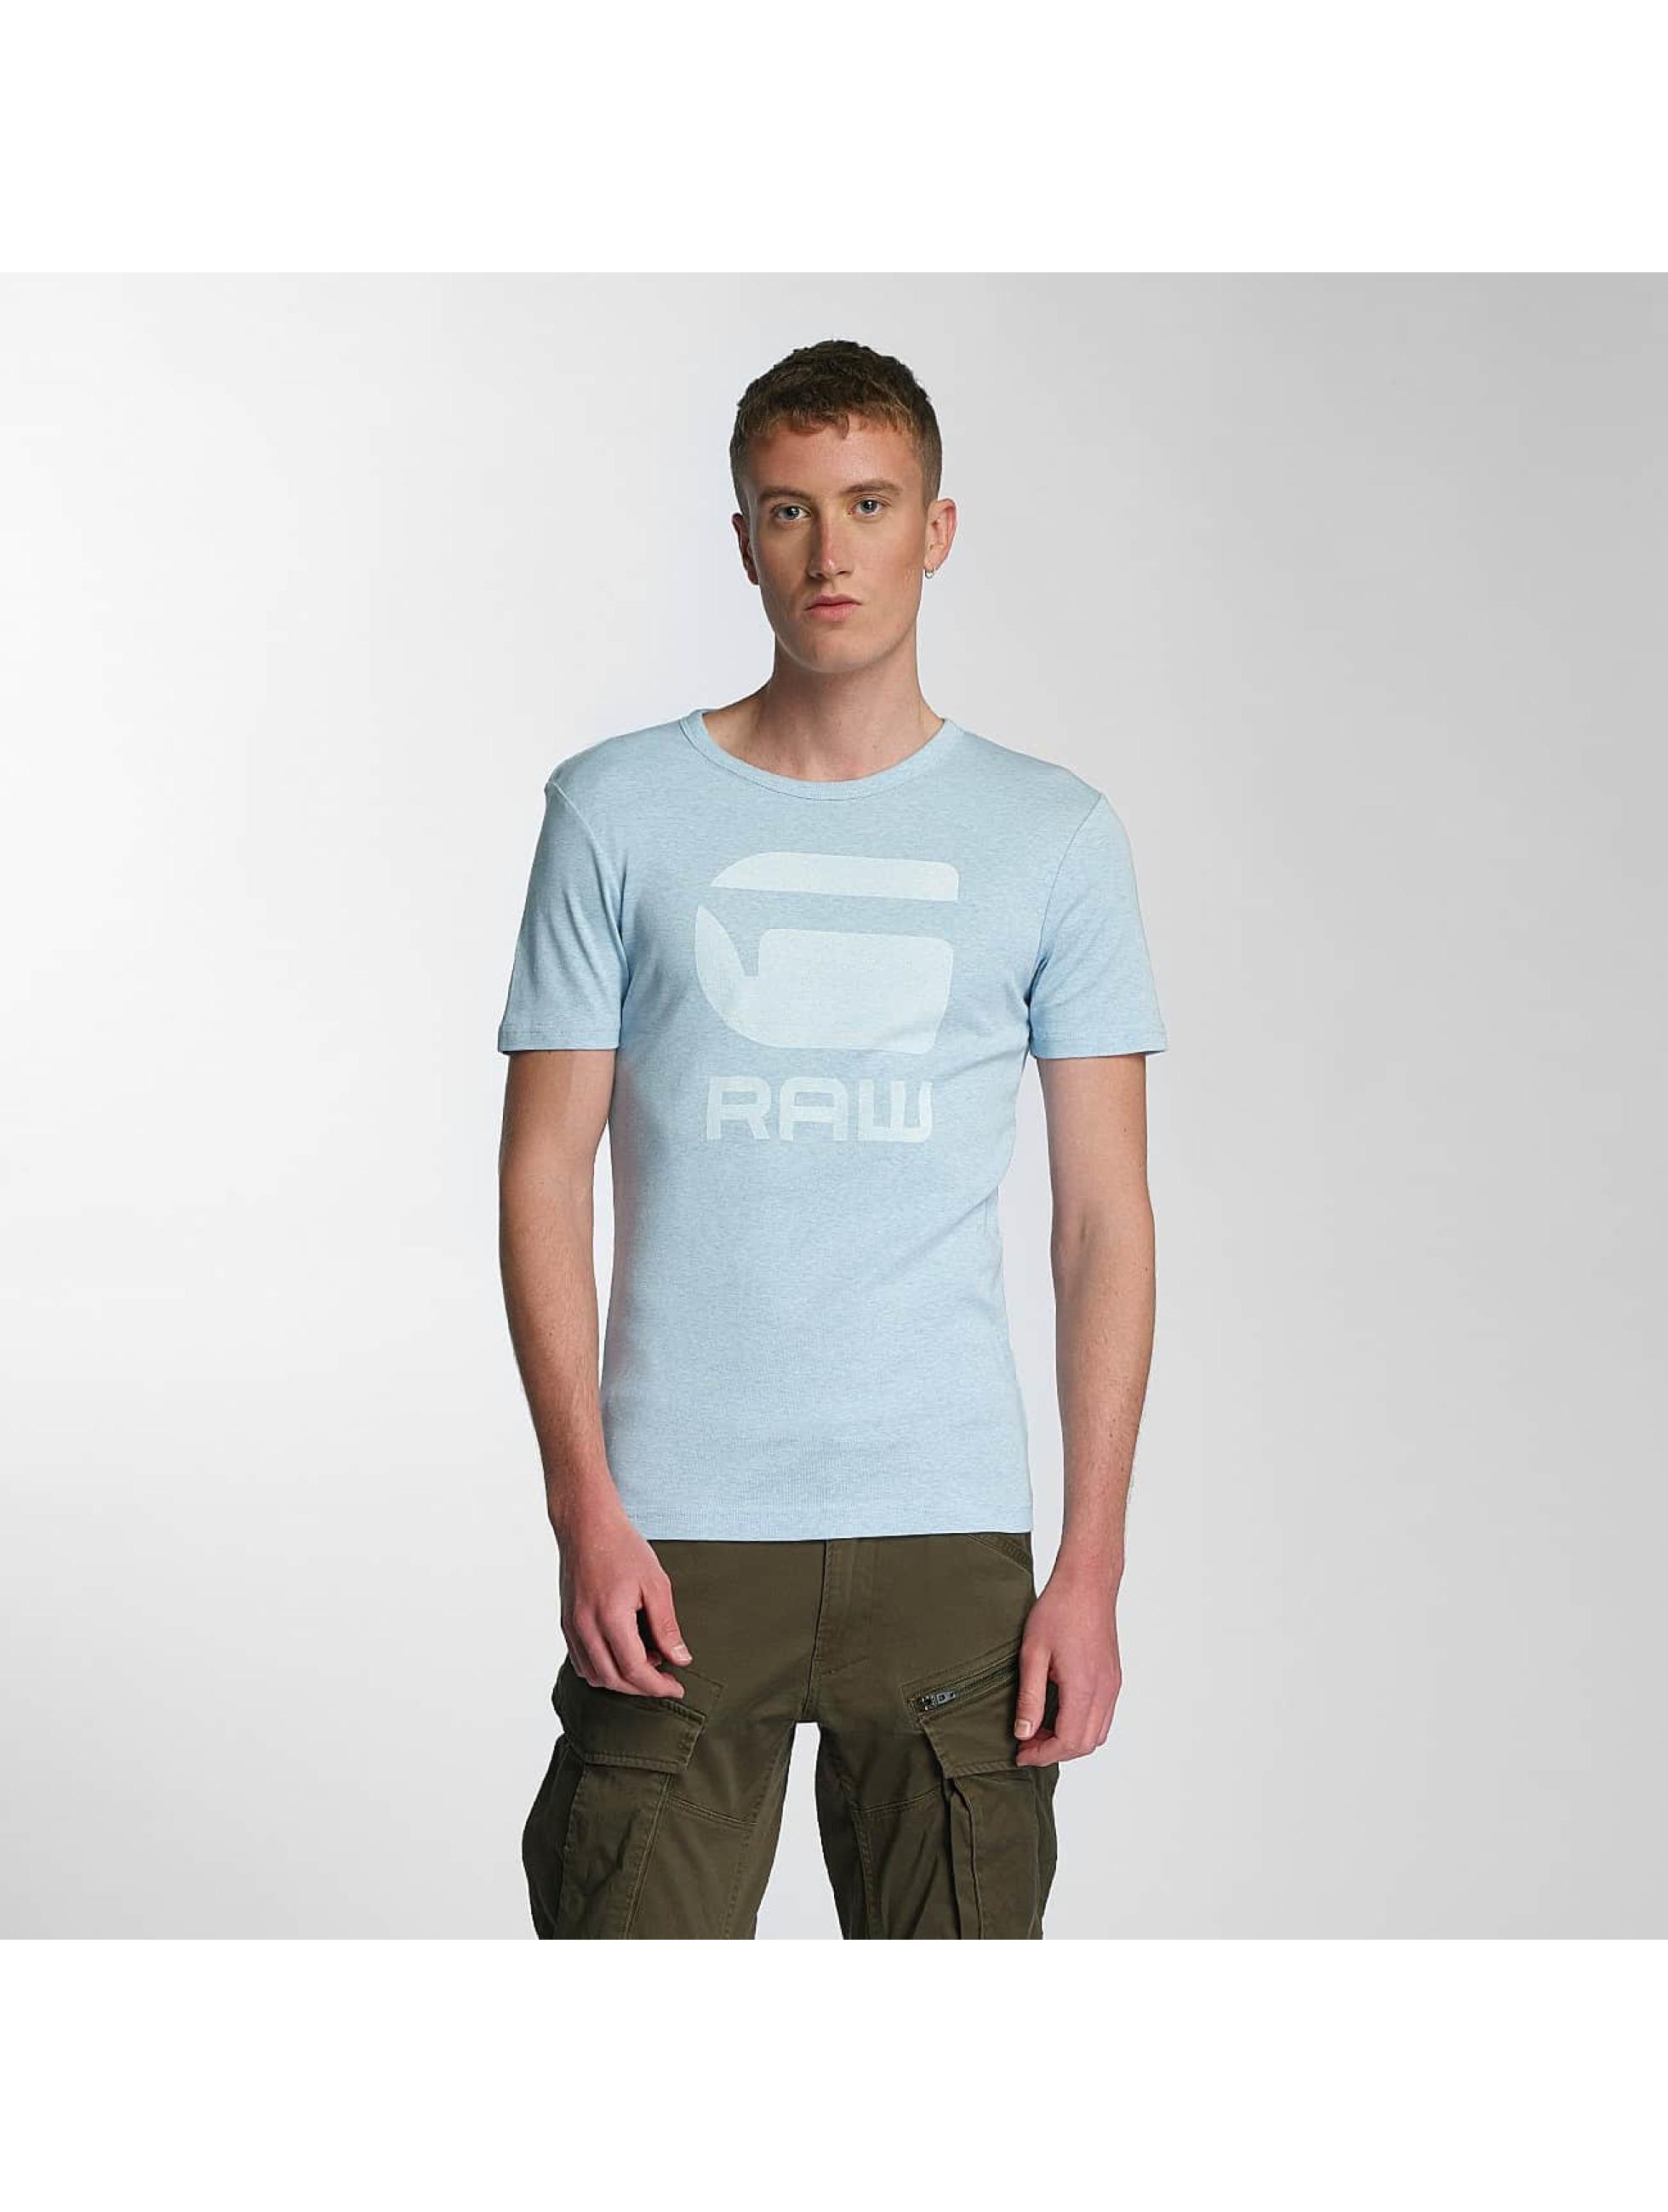 G-Star Männer T-Shirt Drillon Cool Rib in blau